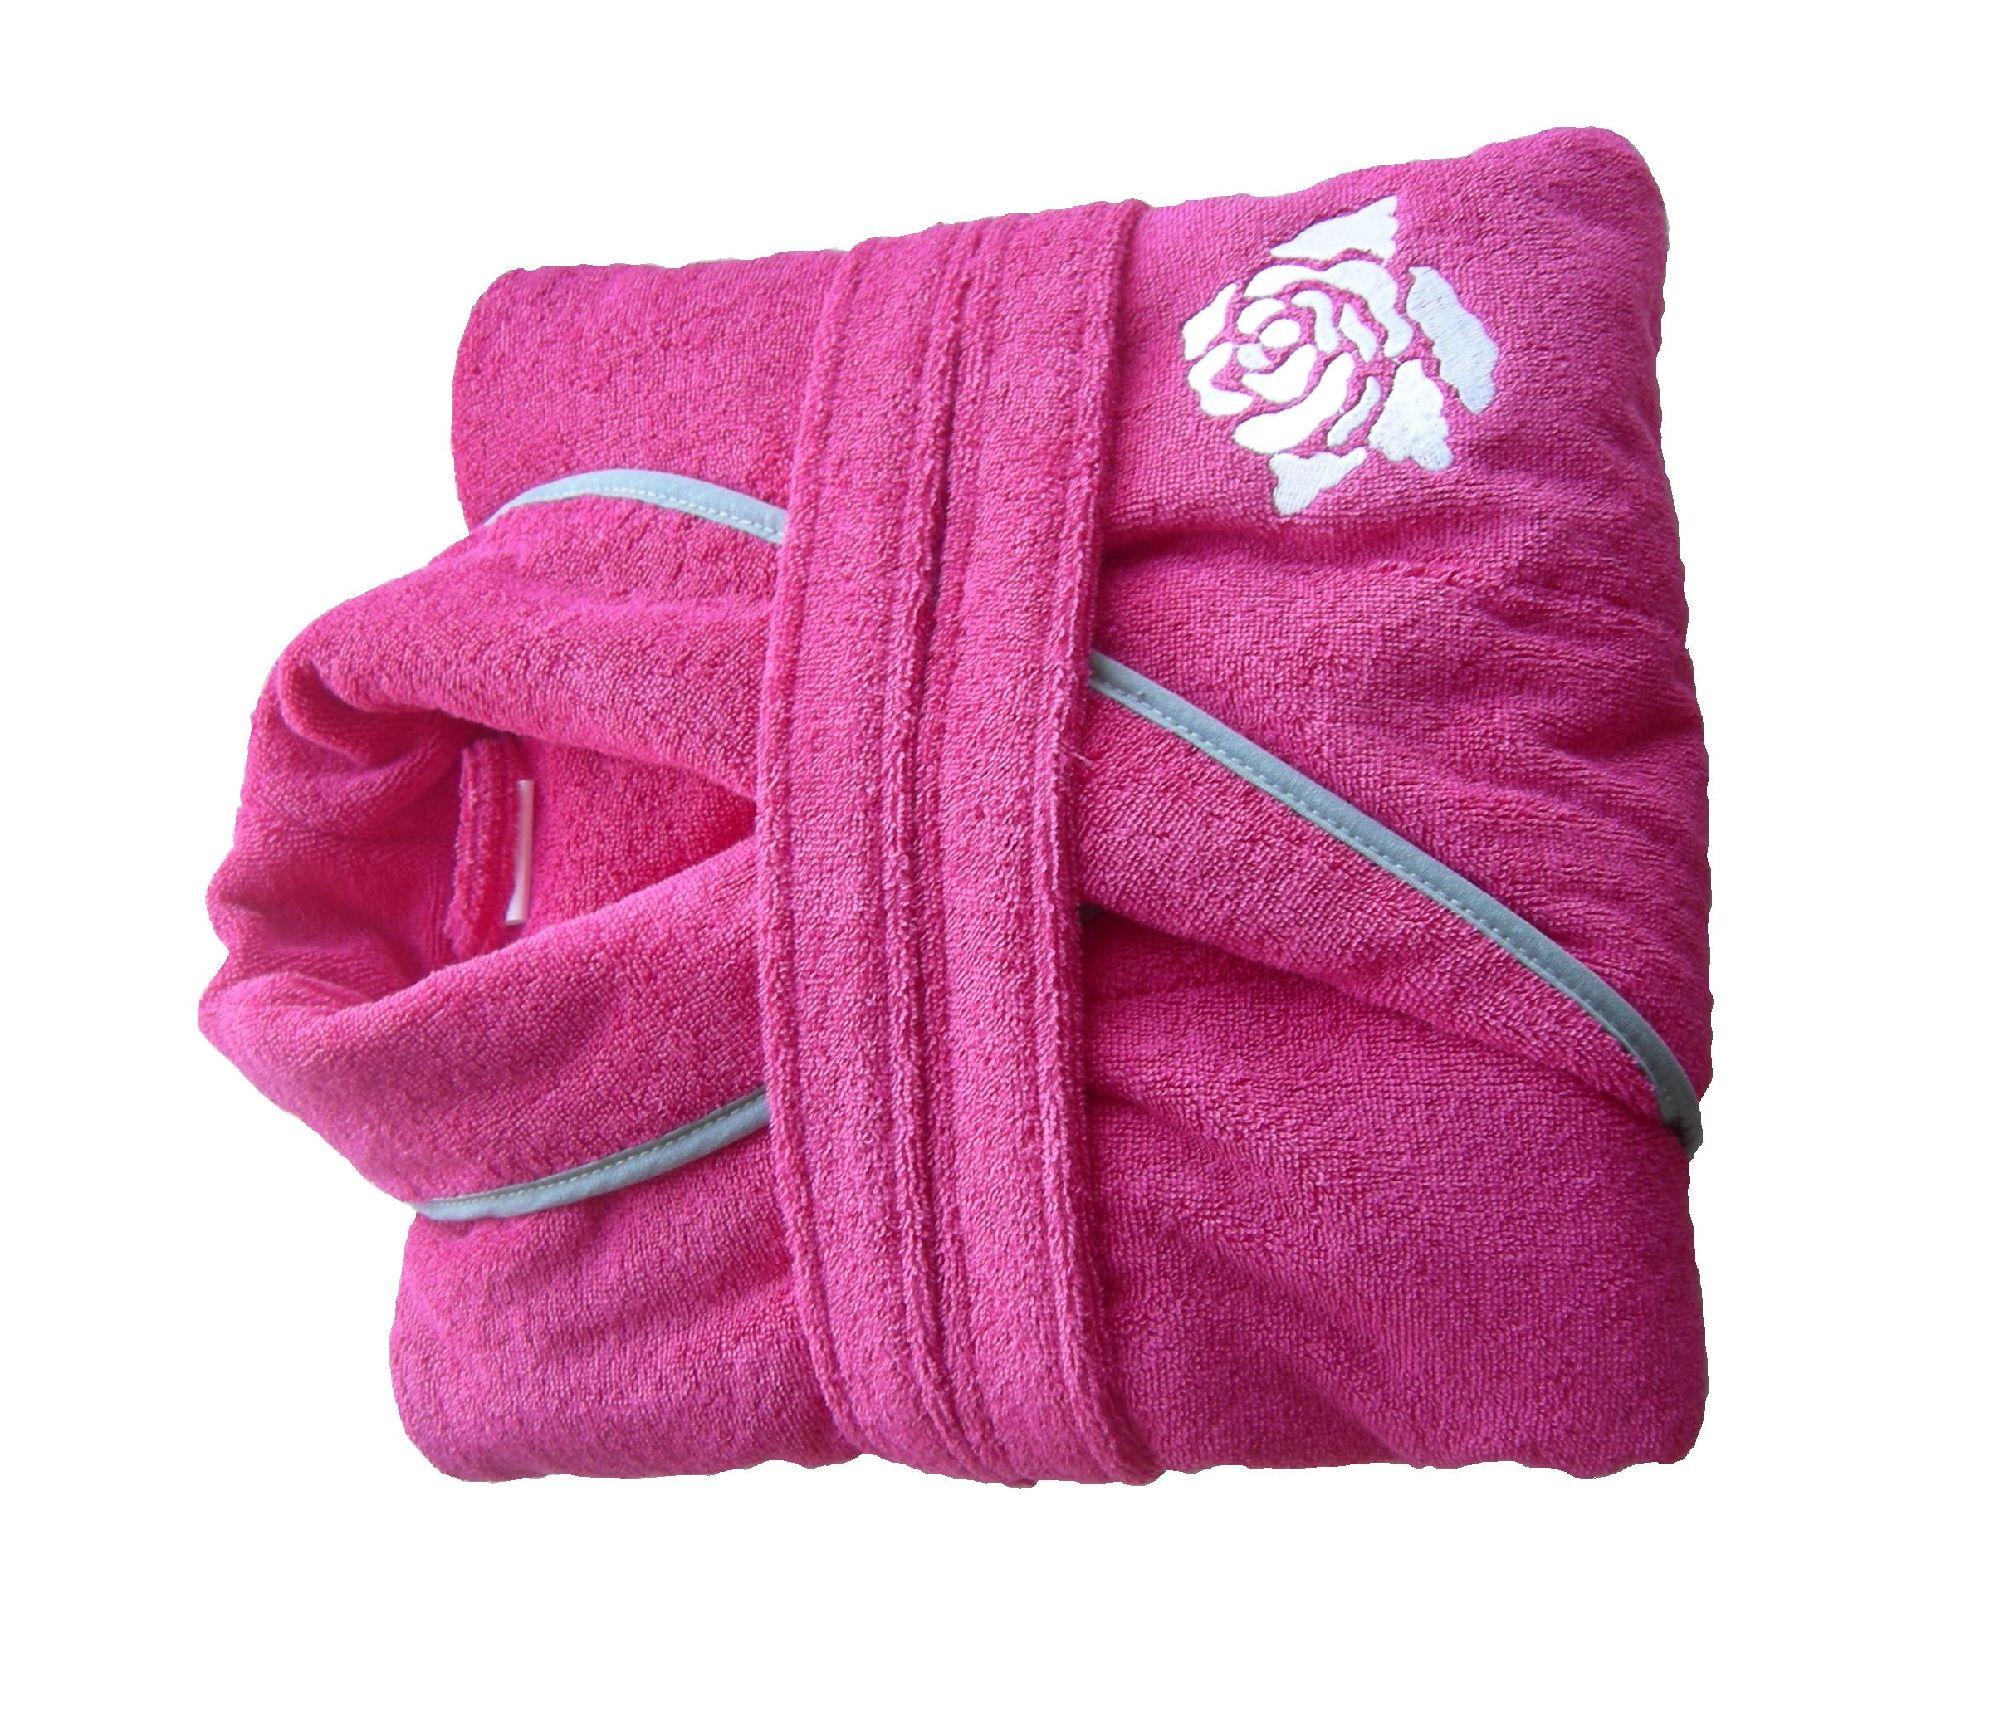 Bath Slipper, Robes and Towels